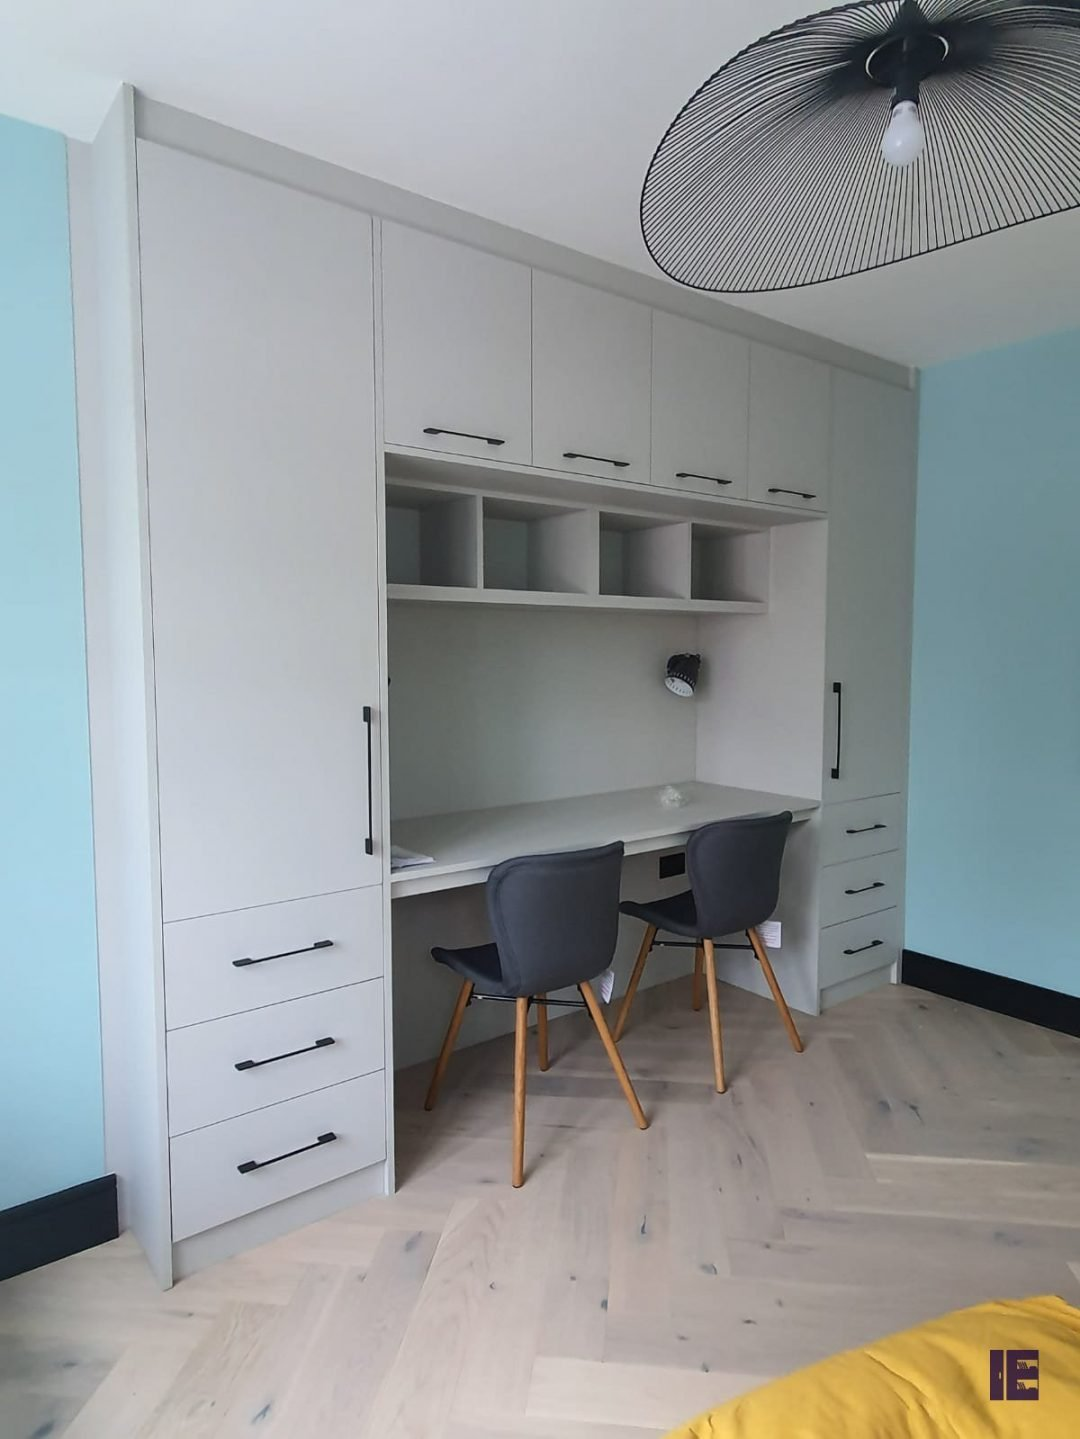 Bespoke Furniture, Study Area, Office Area, in light grey finish